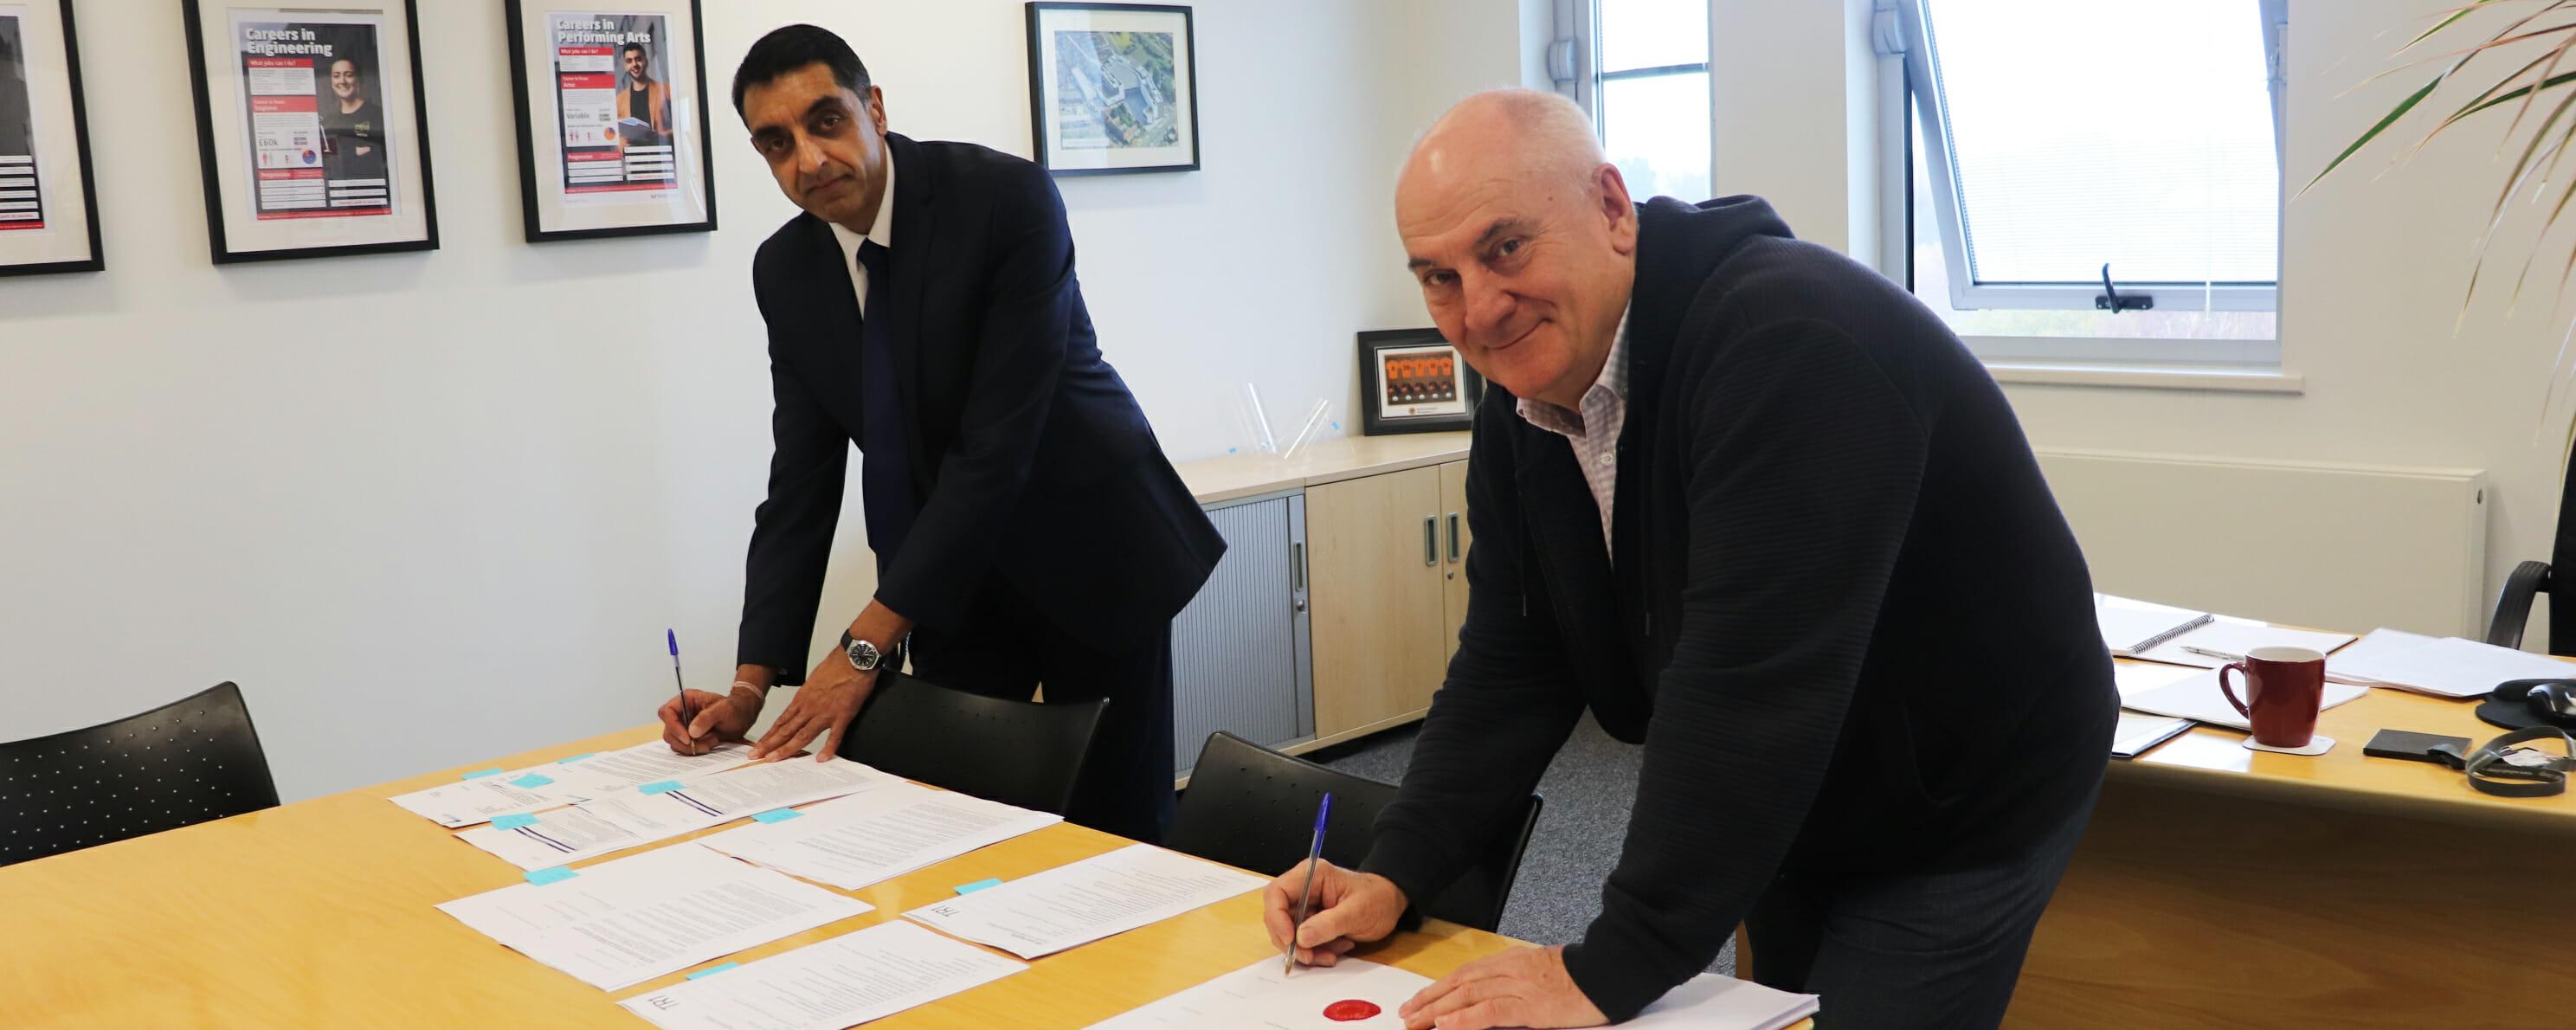 Jatinder Sharma OBE & Allan Pinnegar web